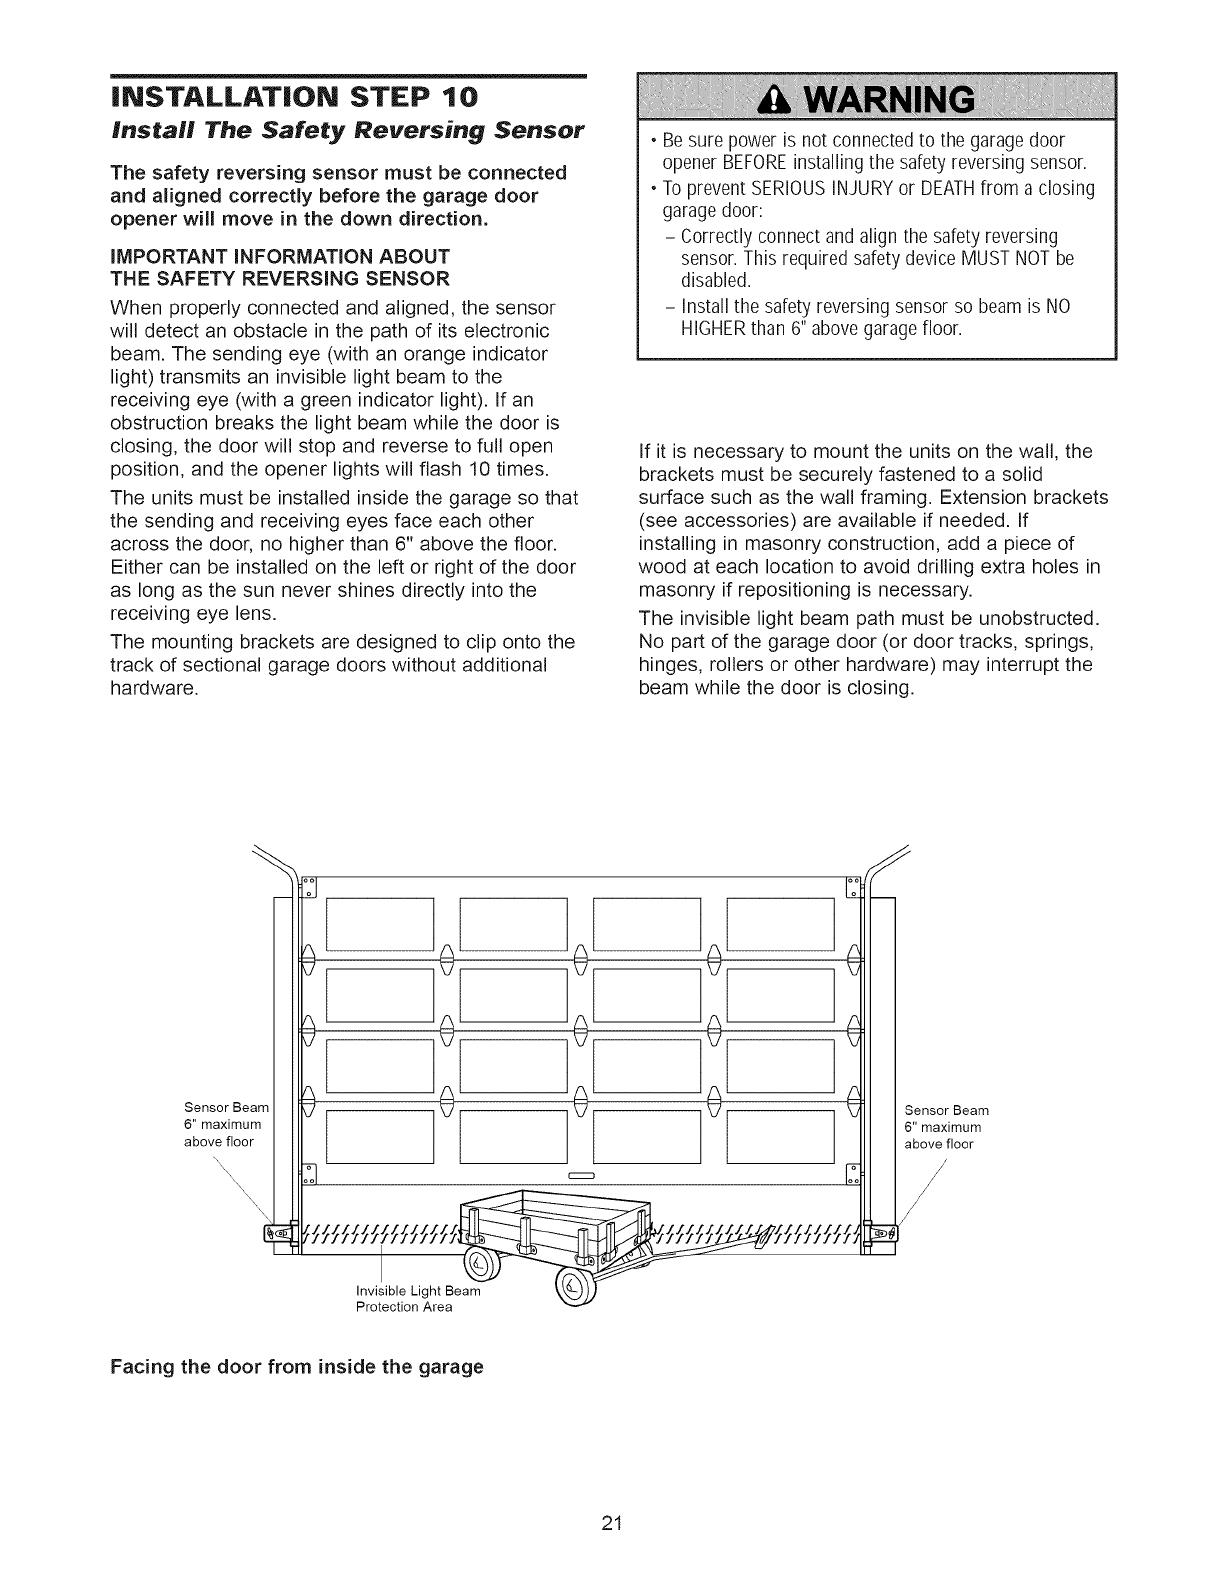 Craftsman 13953976srt User Manual Garage Door Opener Manuals And Safety Reversing Sensor Wiring Diagram Installation Step 10 Install The